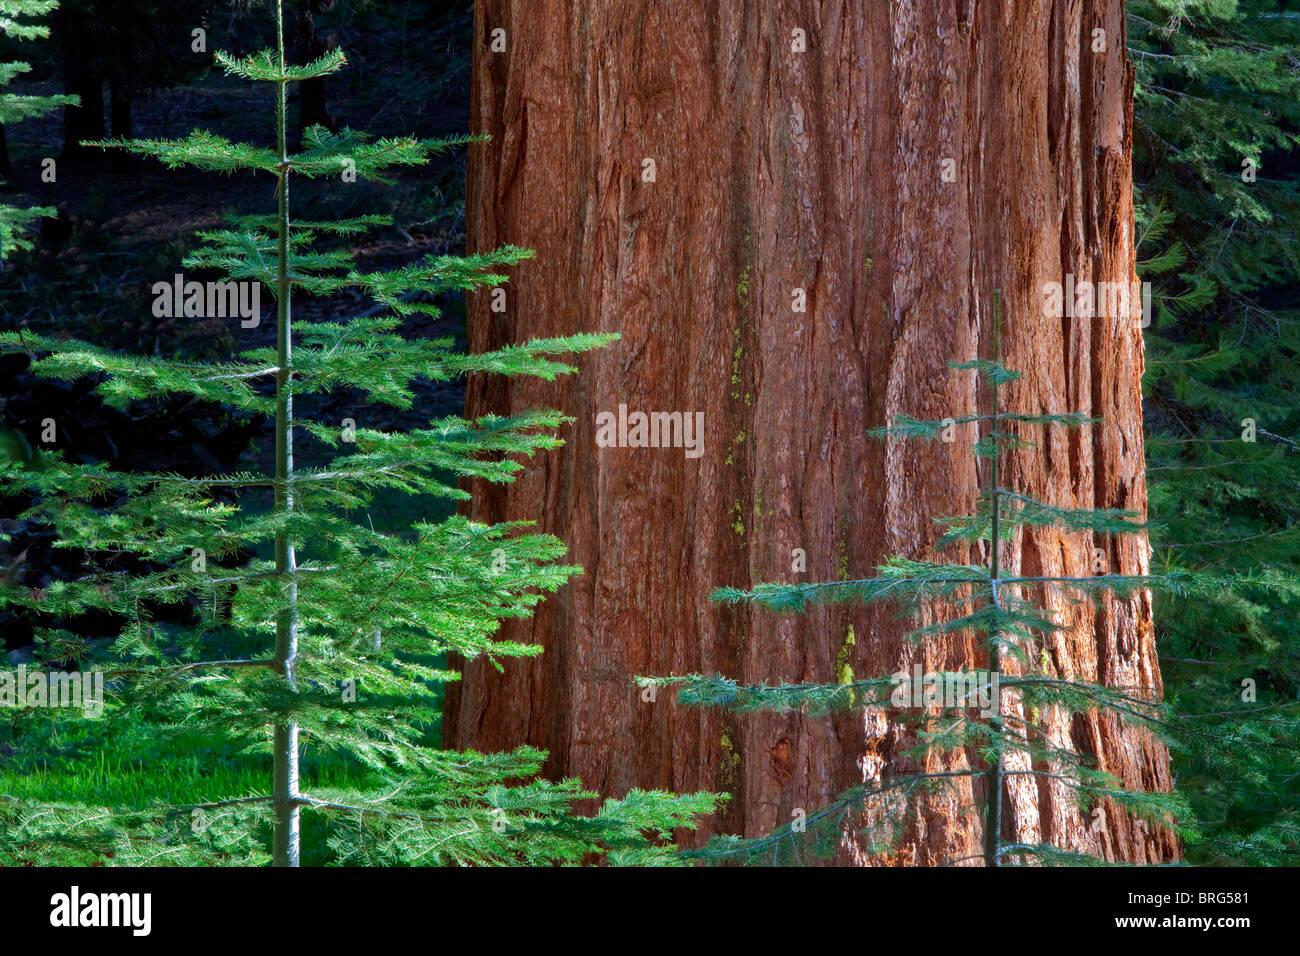 Giant Sequoia Redwood with smaller fir tree. Mariposa Grove. Yosemite National Park, California - Stock Image